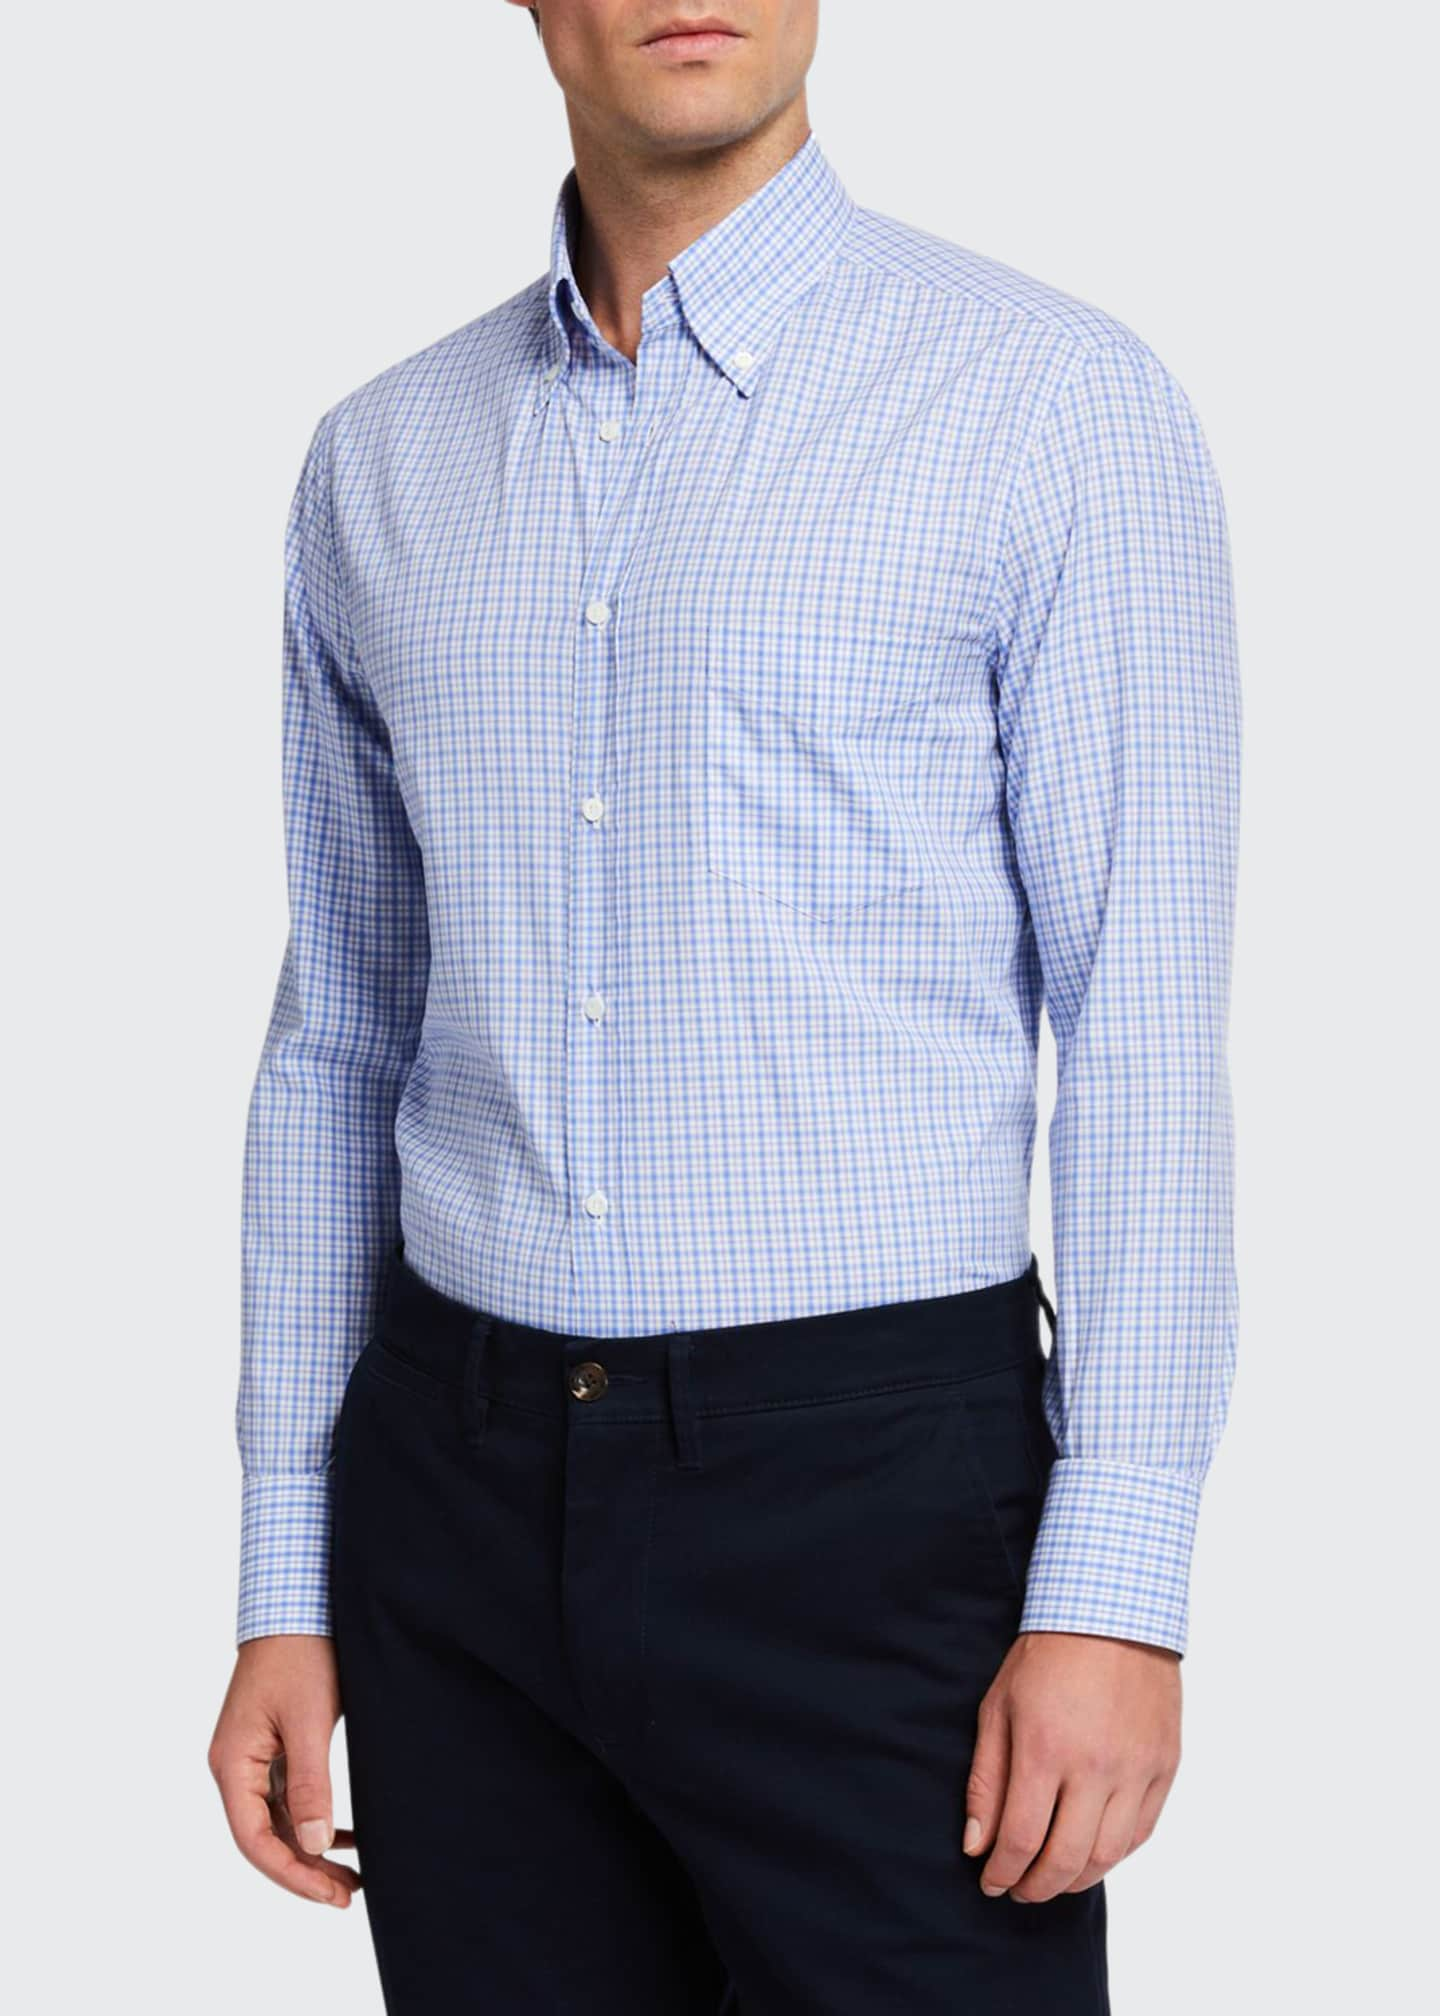 Brunello Cucinelli Men's Basic Plaid Sport Shirt with